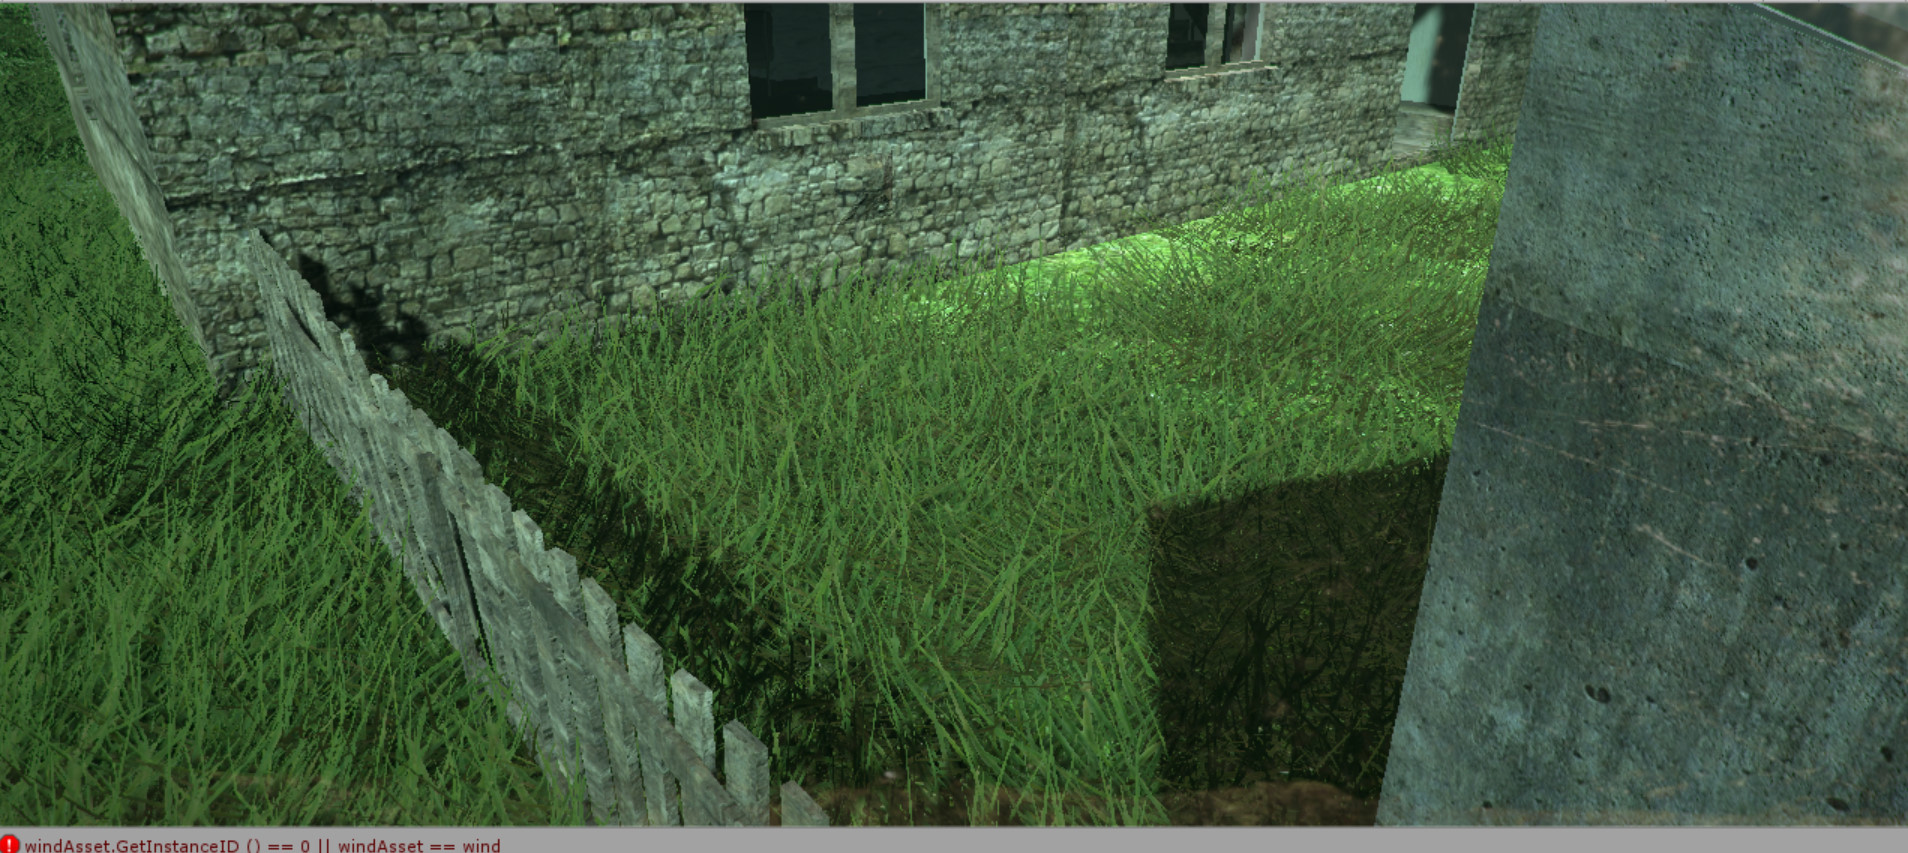 BEST WAY OF MAKING GRASS! looks a lot like speed tree grass, runs as